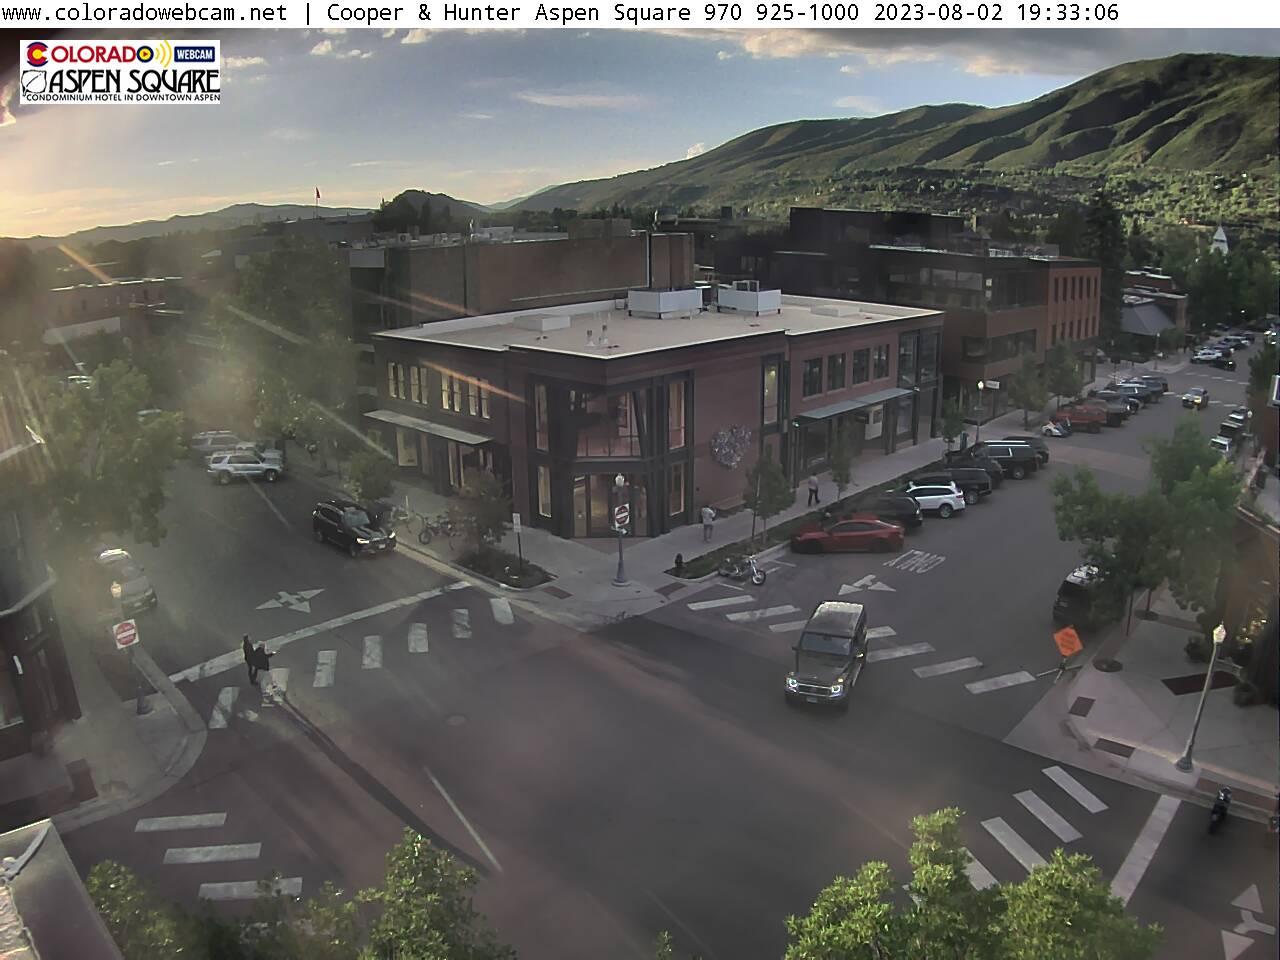 Aspen Square